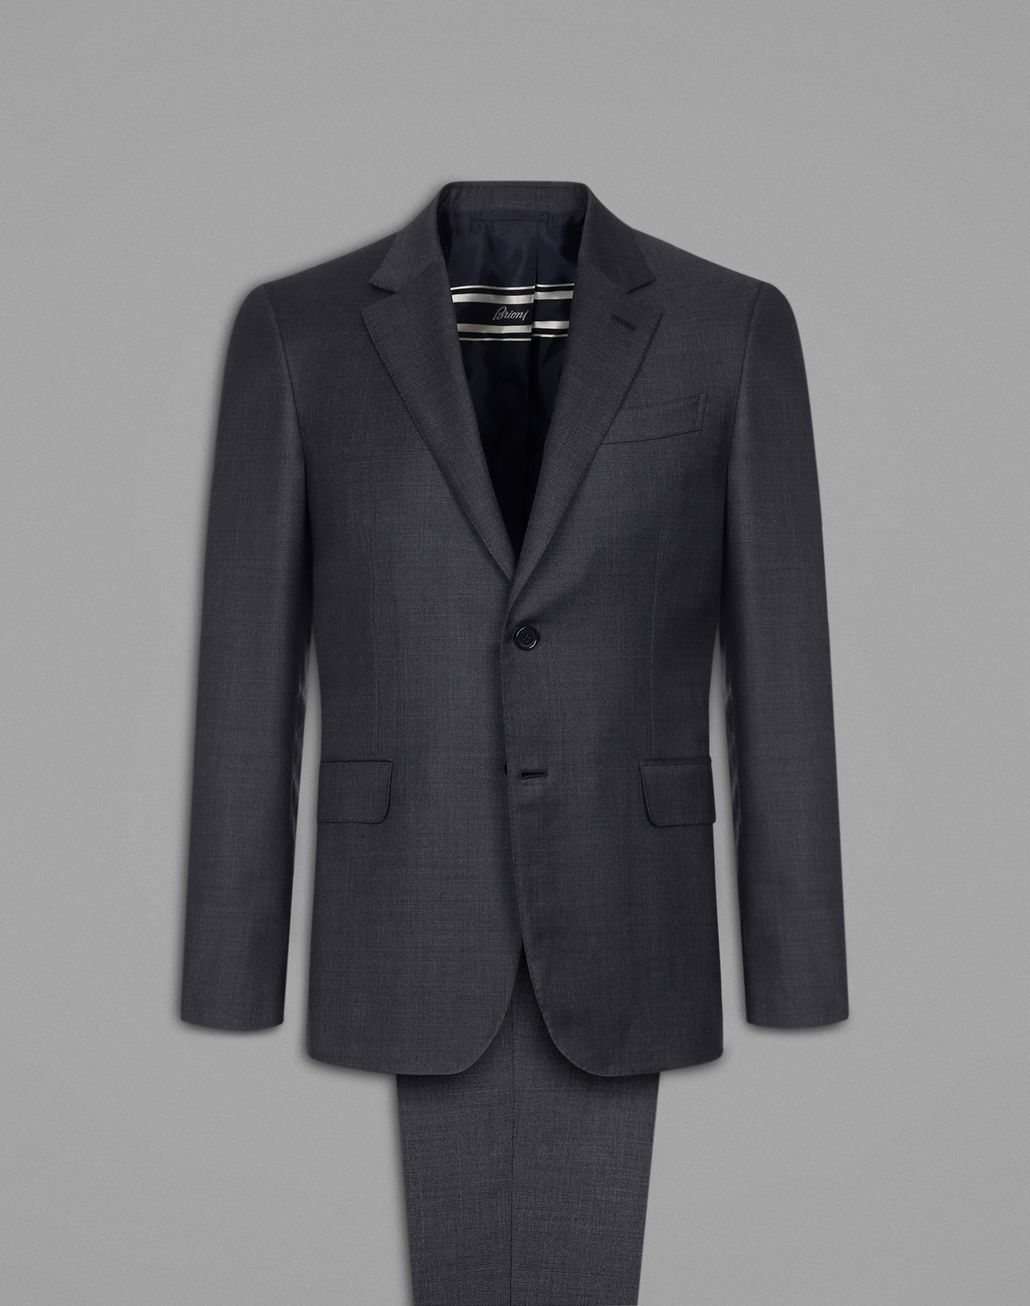 BRIONI Серый Костюм Primo Suits & Jackets Для Мужчин f